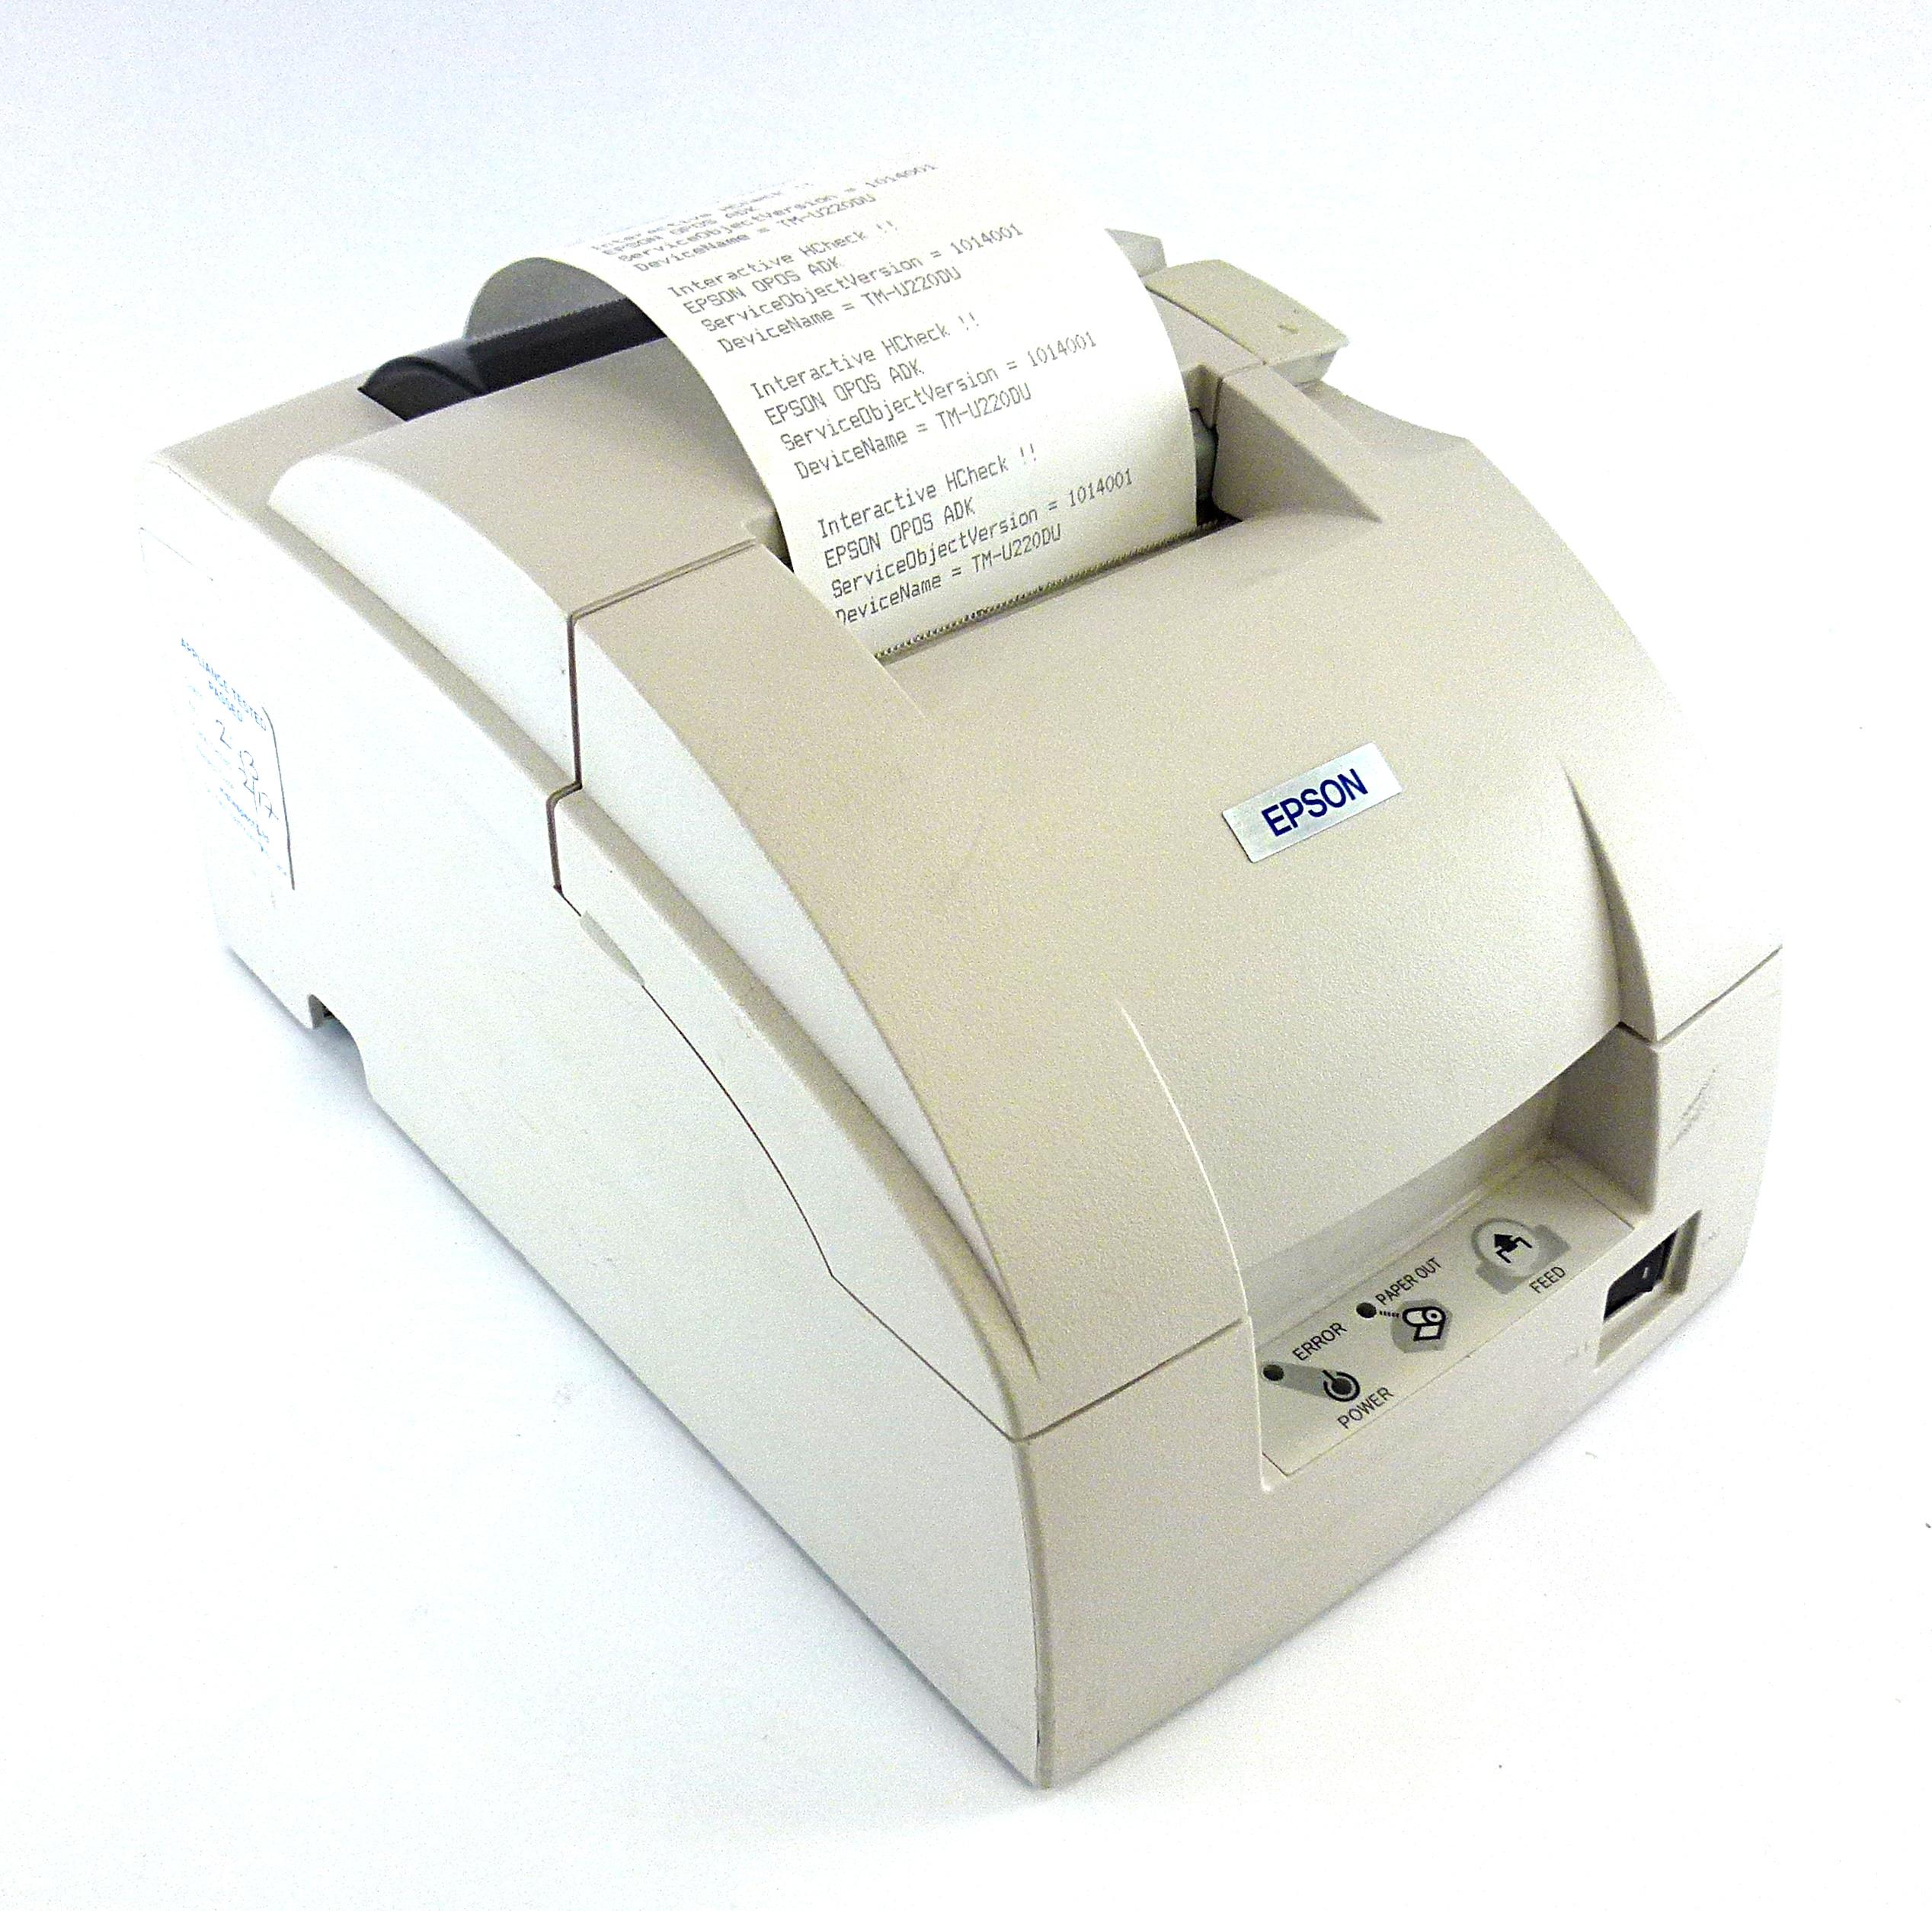 EPSON TM-U220 MODEL M188D WINDOWS 8.1 DRIVER